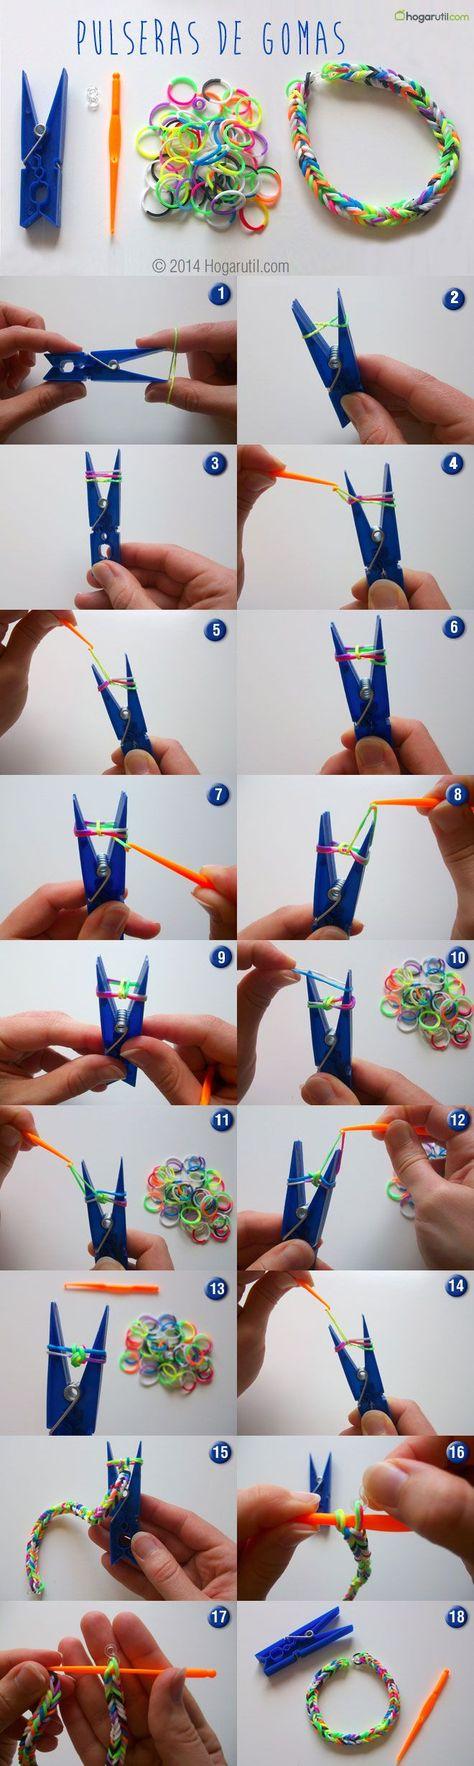 Pulseras de gomas - Paso a paso | DIY rubber band bracelets - Step by step #DIY #manualidades #video